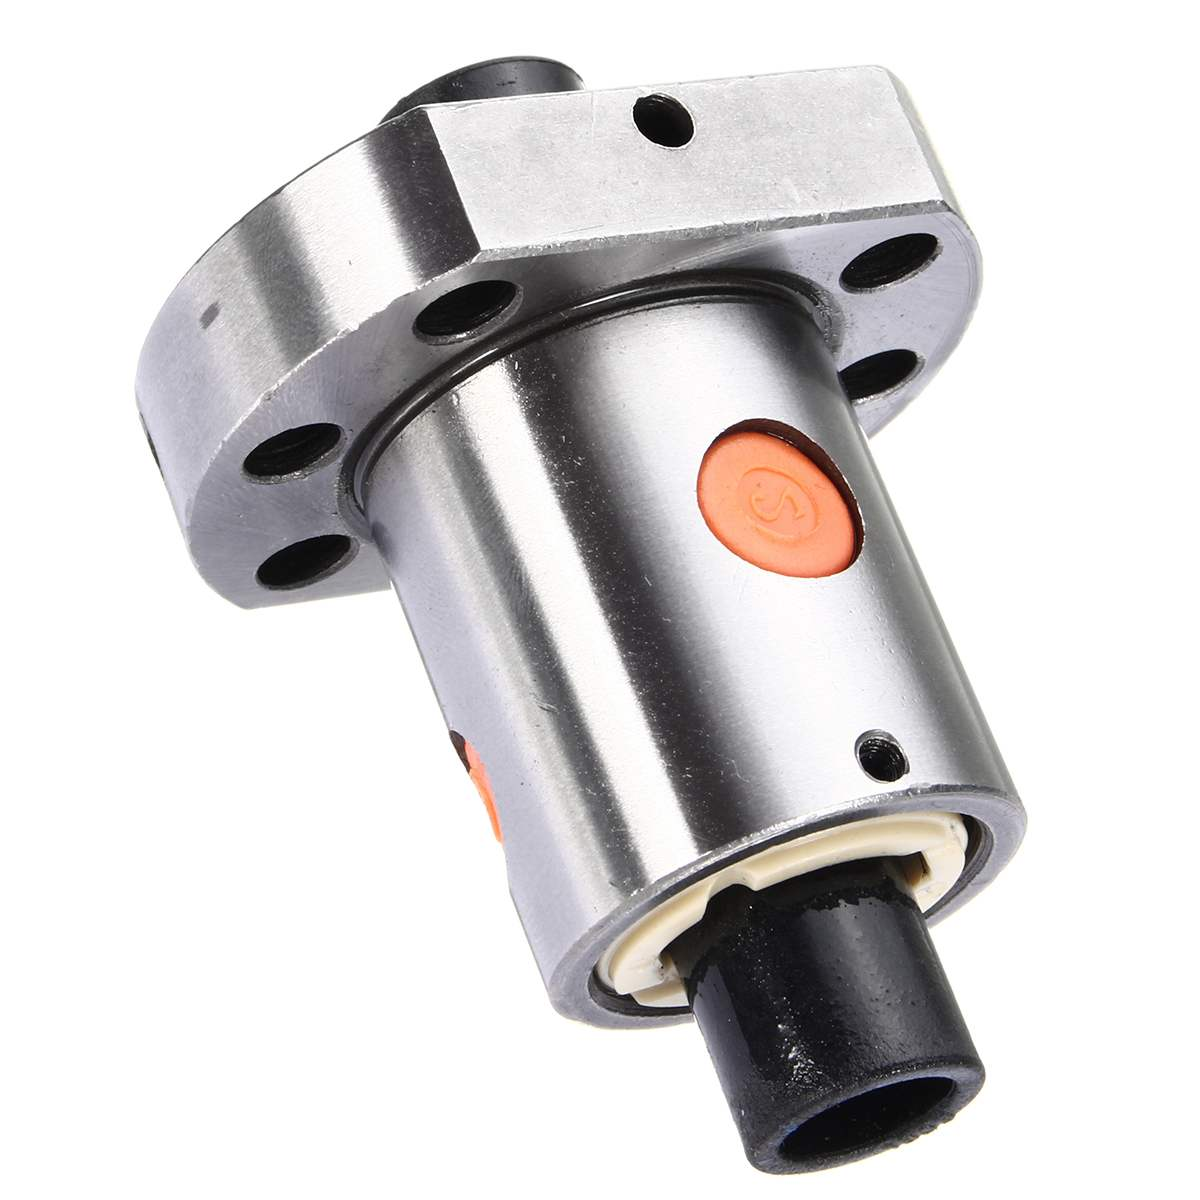 1 pieza de acero al carbono de alta resistencia SFU1605 tuerca de bola 16mm tornillo de bola acero de carbono RM1605 tuerca para 1605 tuerca carcasa envío gratis